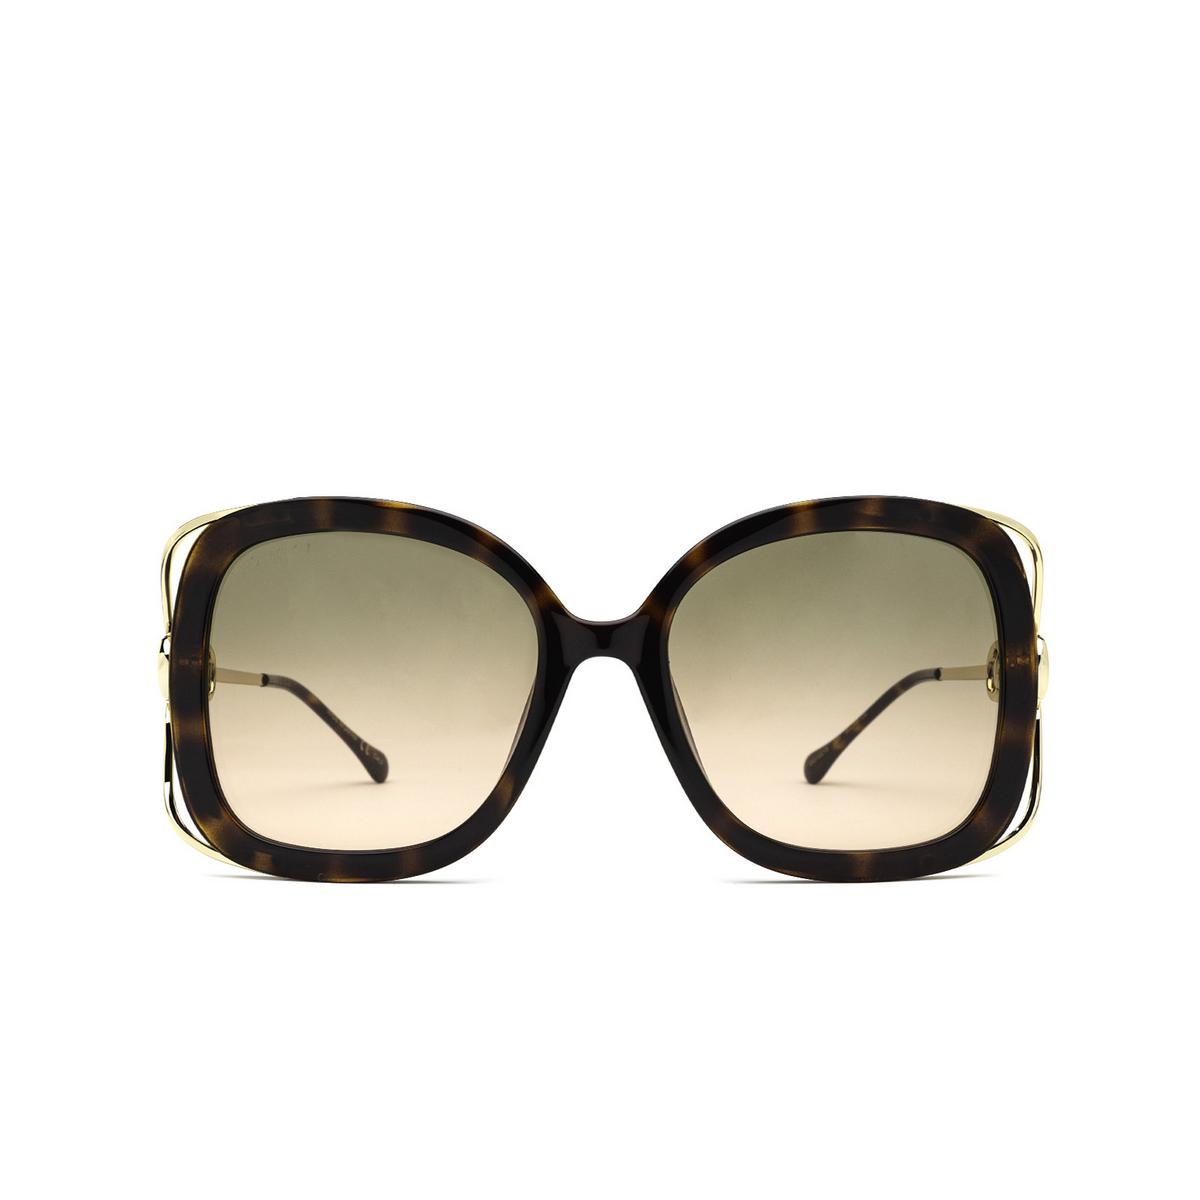 Gucci® Square Sunglasses: GG1021S color Havana 001 - front view.